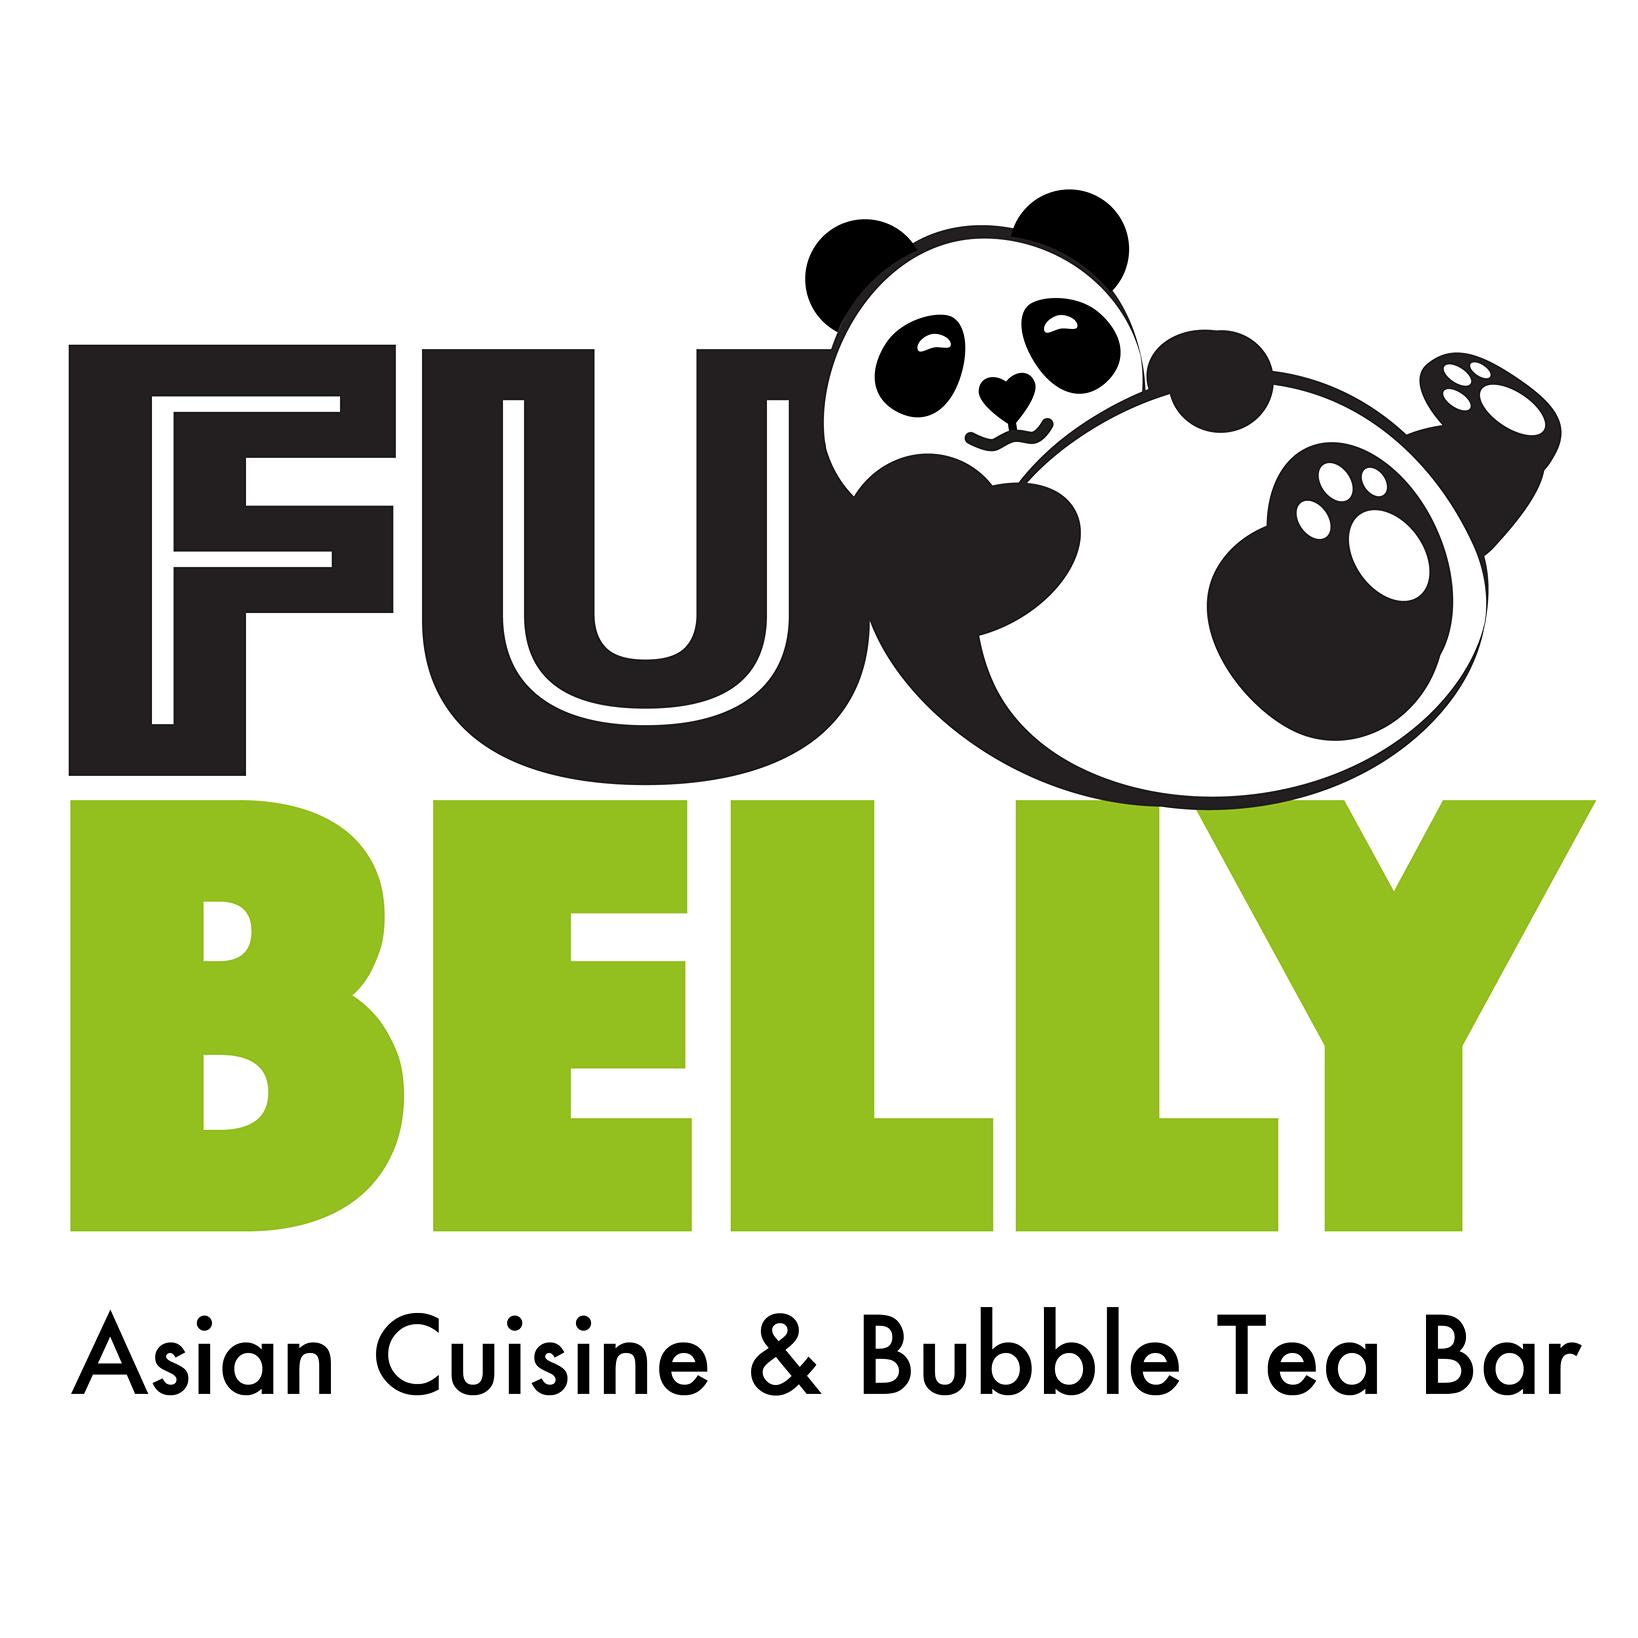 FU Belly Asian Cuisine & Bubble Tea Bar image 0